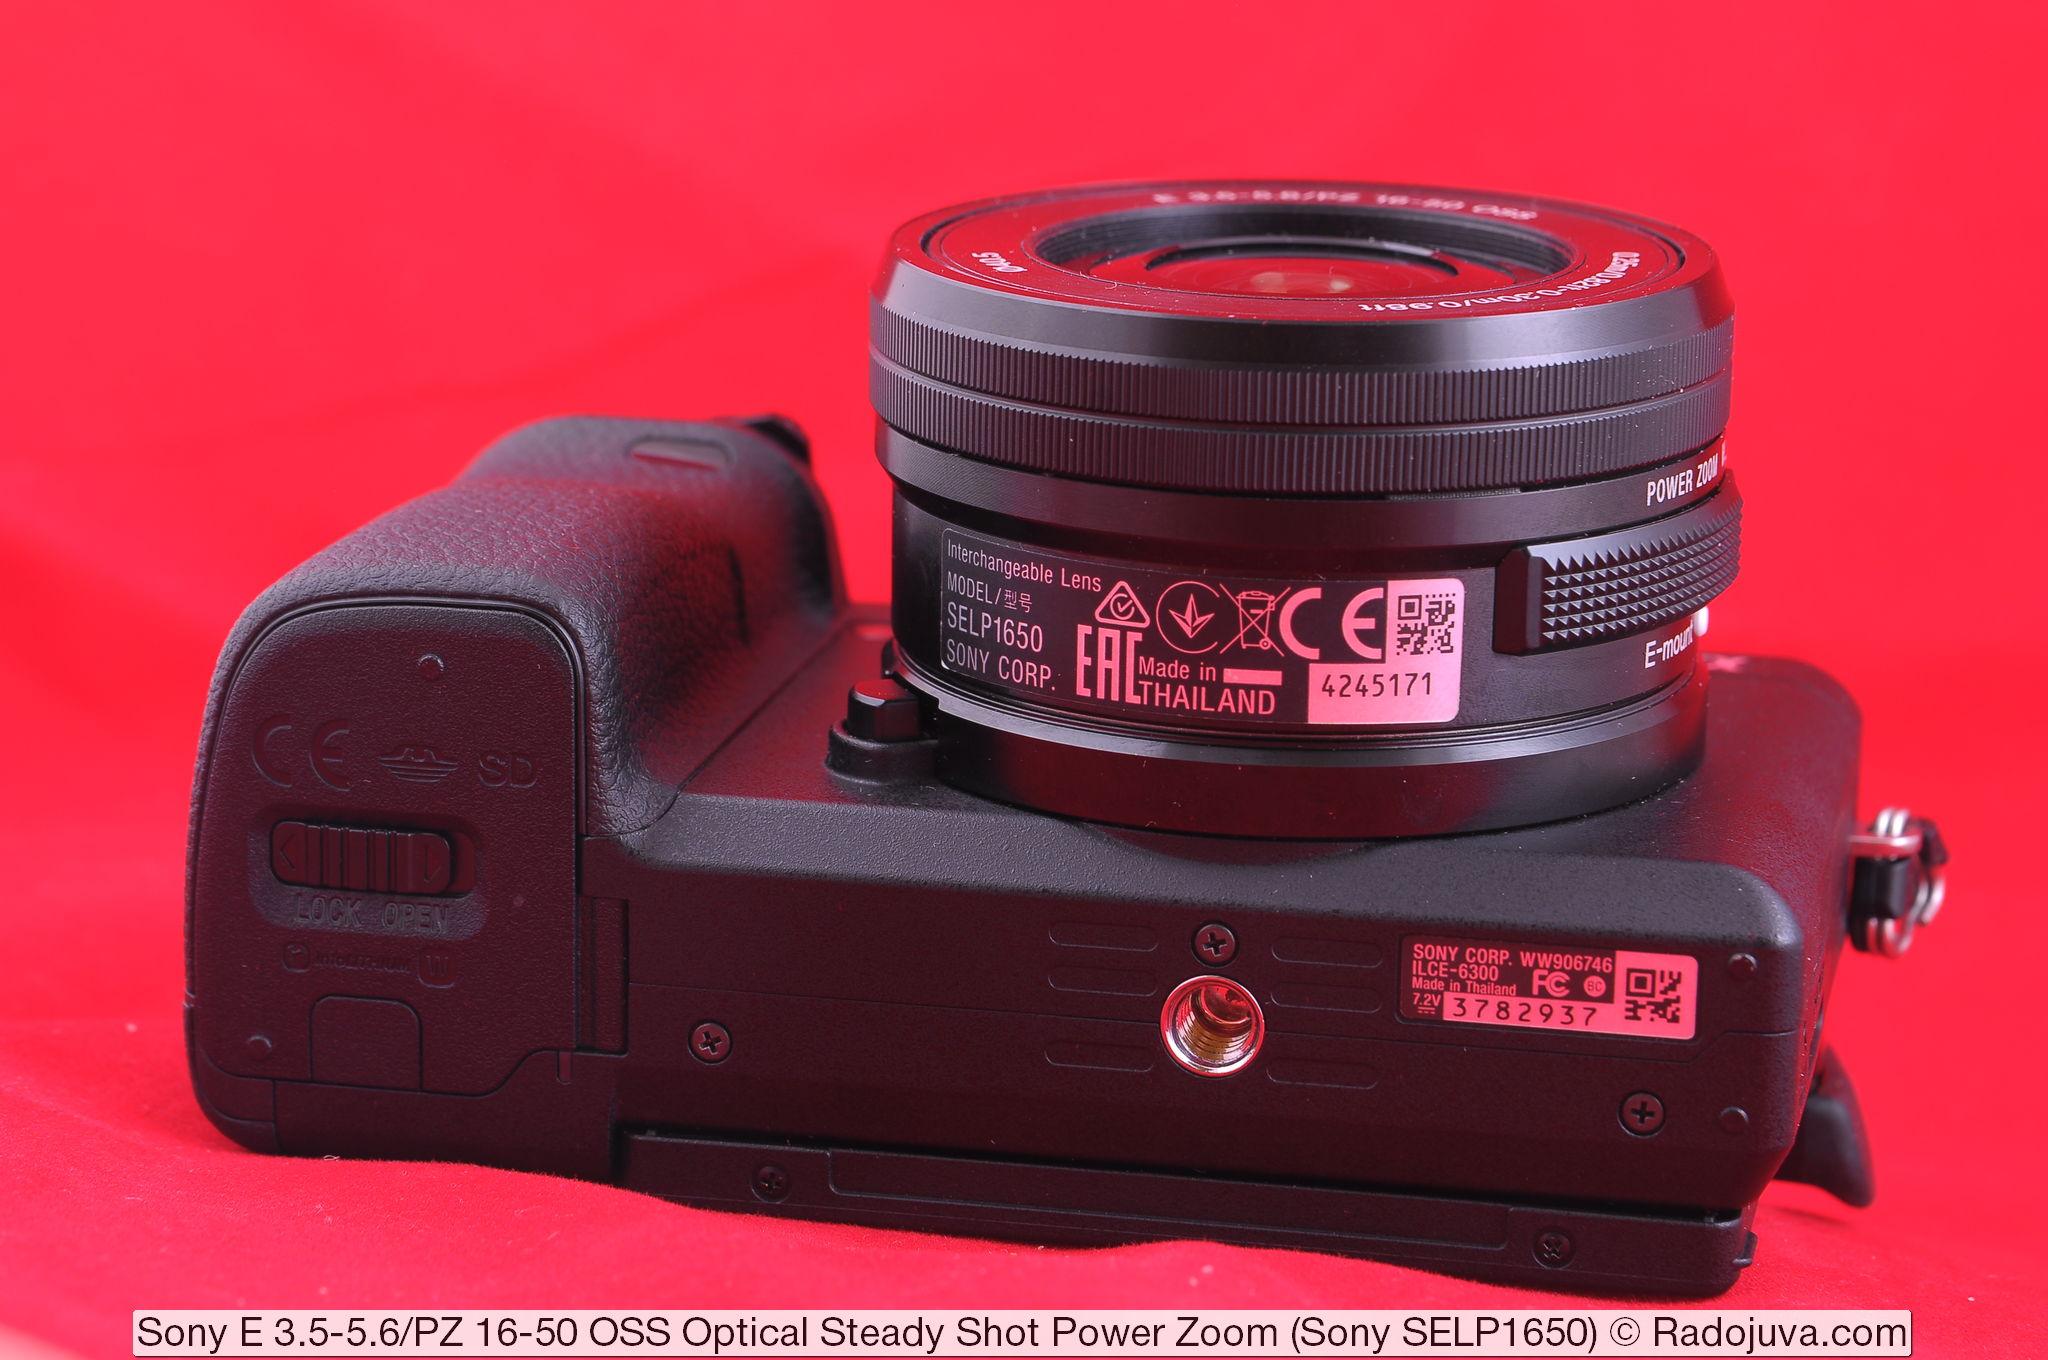 Sony E 3.5-5.6/PZ 16-50 OSS Optical Steady Shot Power Zoom (Sony SELP1650). Объектив показан на беззеркальном фотоаппарате Sony a6300 (ILCE-6300).